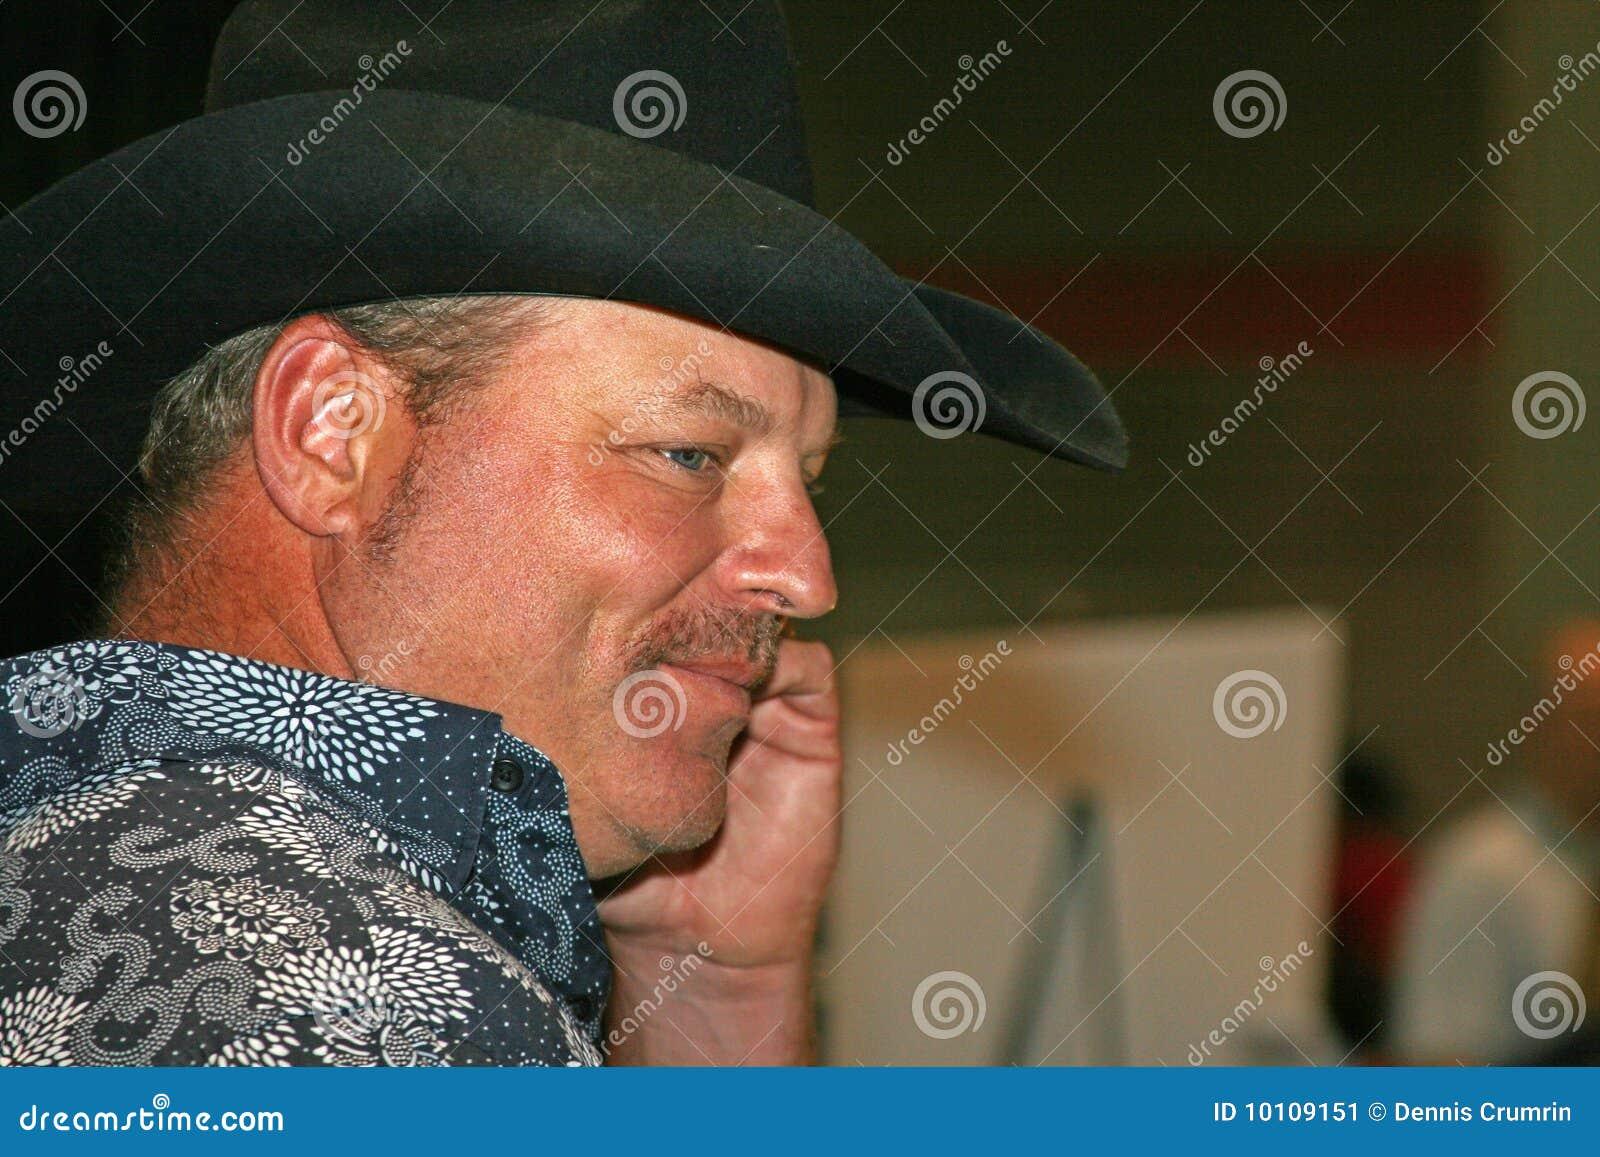 John michael montgomery, facial hair pics